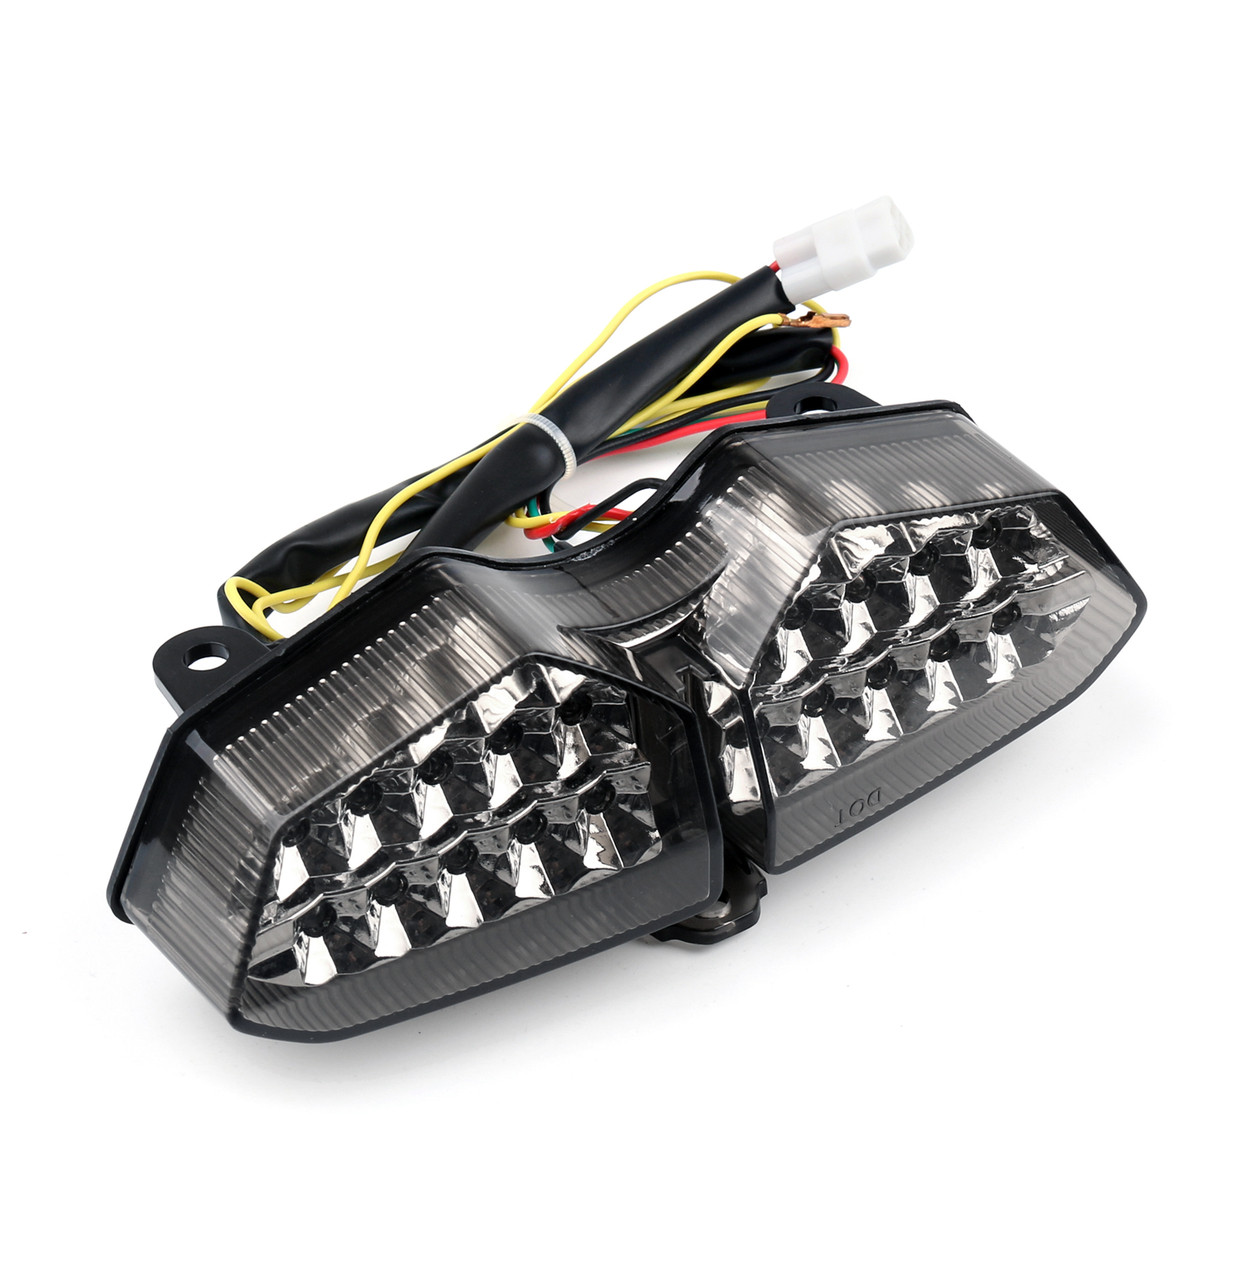 http://www.madhornets.store/AMZ/MotoPart/Taillight/TL-319/TL-319-Smoke-3.jpg